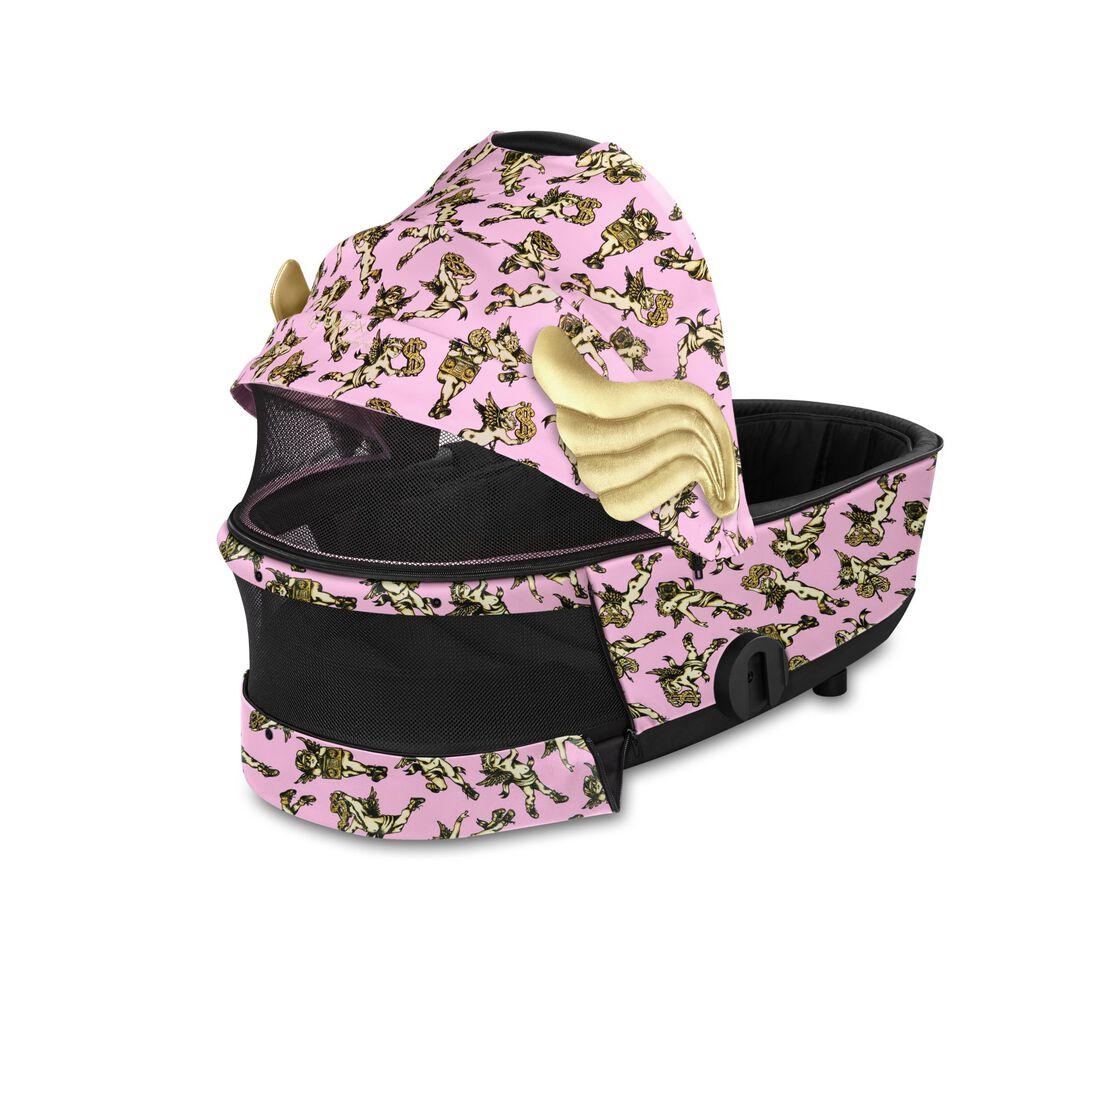 CYBEX Mios Lux Carry Cot - Cherubs Pink in Cherubs Pink large Bild 3